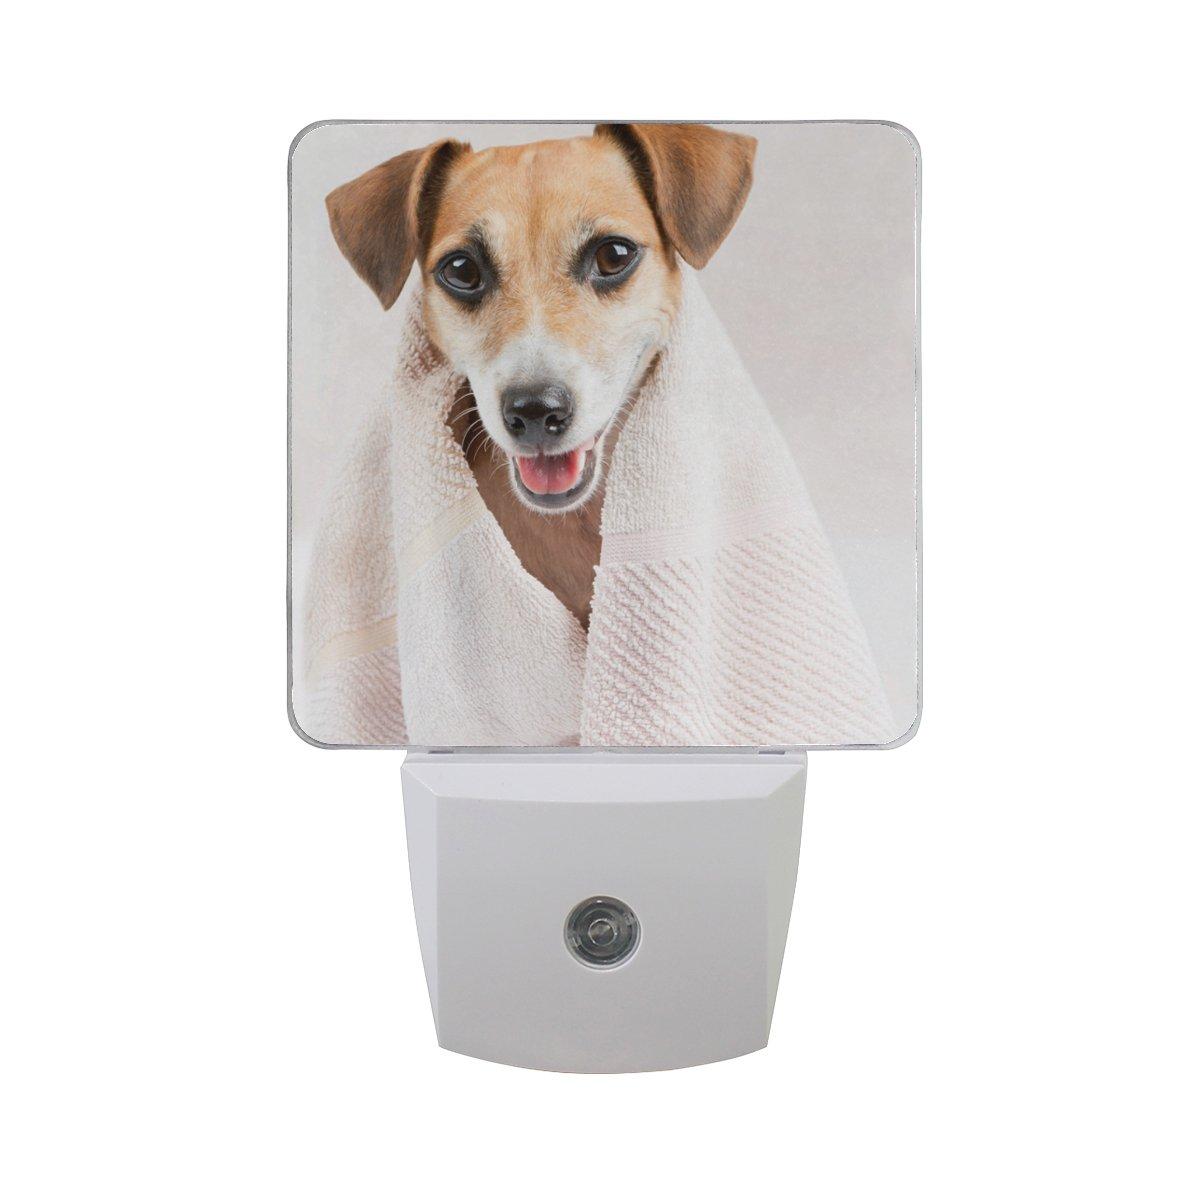 Plug-in LED Night Light Lamp Clean Pet Spa Printing with Dusk to Dawn Sensor for Bedroom, Bathroom, Hallway, Stairways, 2 Pack-0.5W